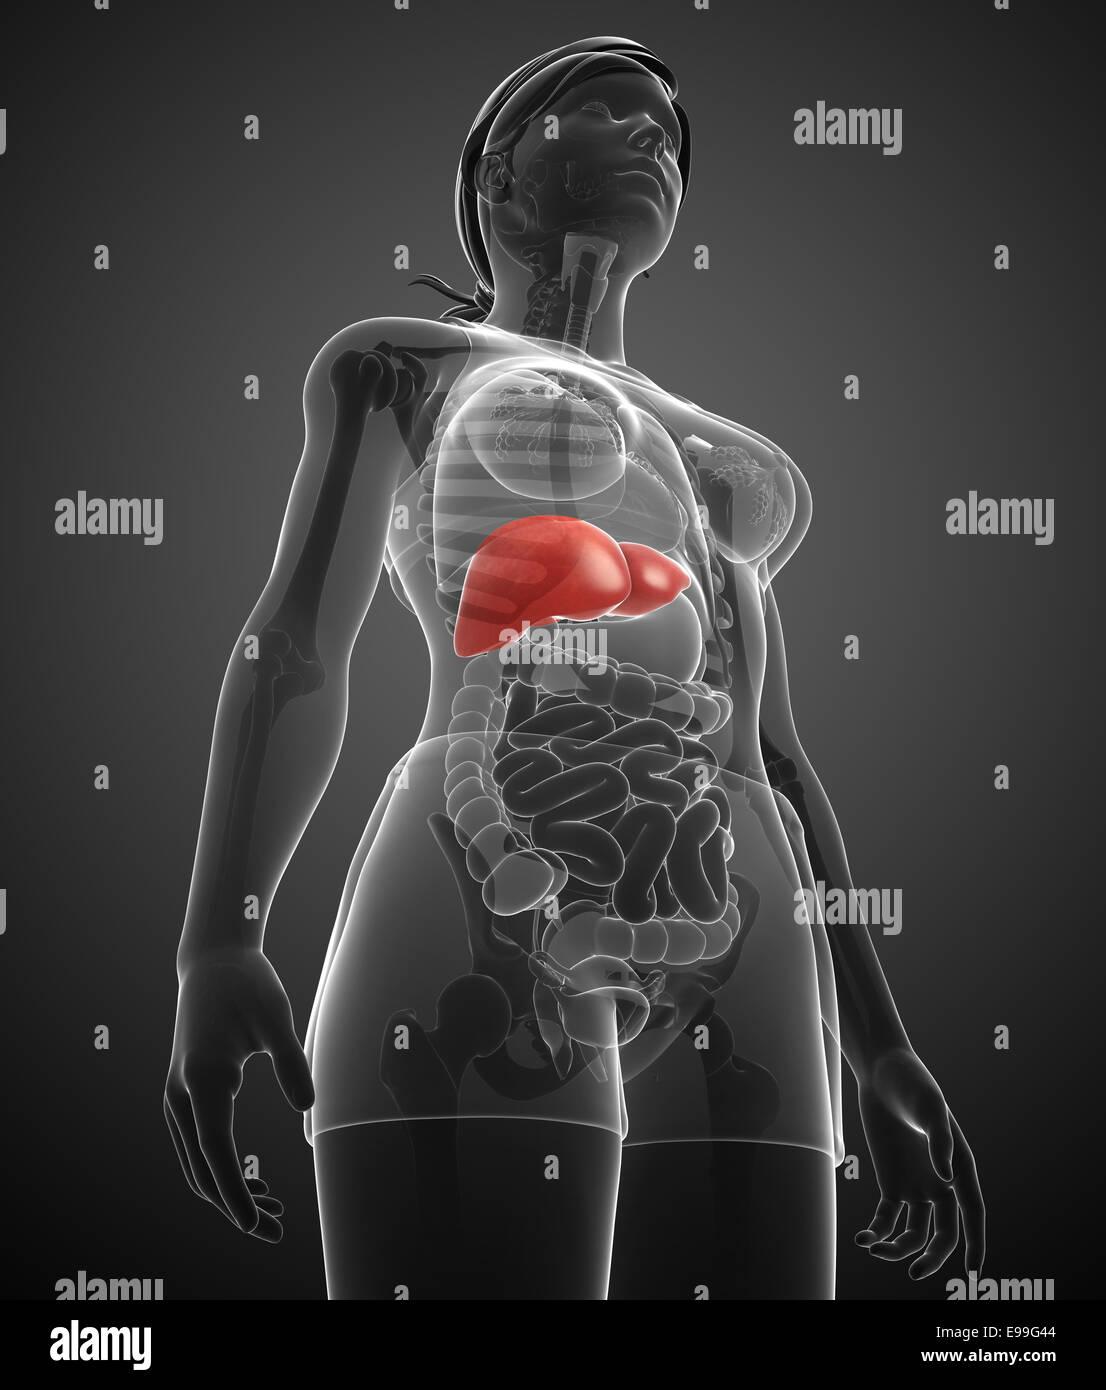 Right Ureter Stockfotos & Right Ureter Bilder - Alamy